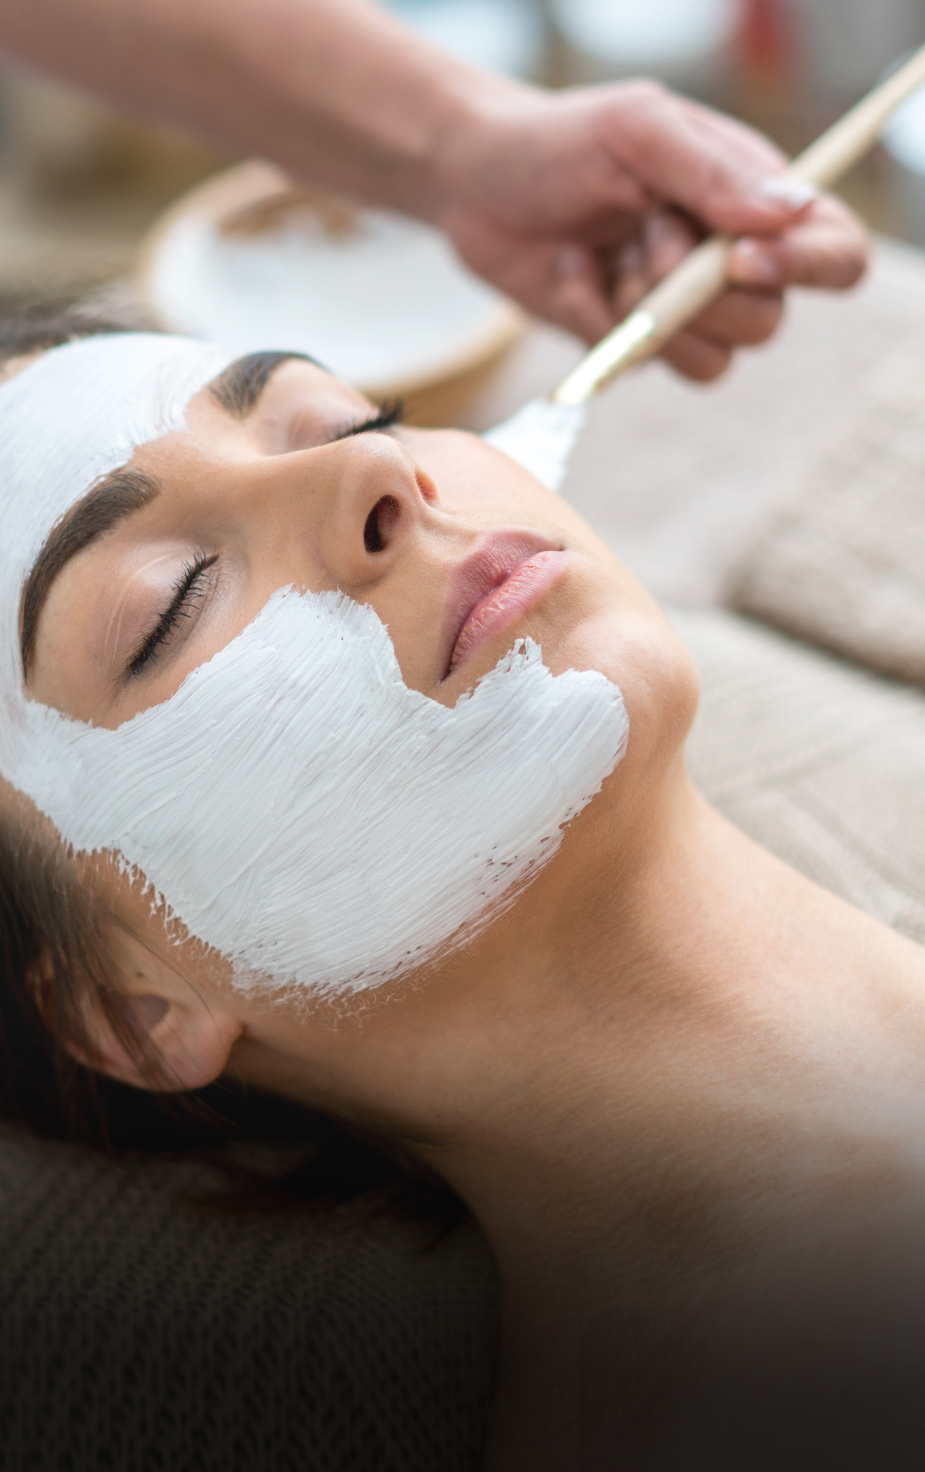 Dynamic Stability Skin Therapy